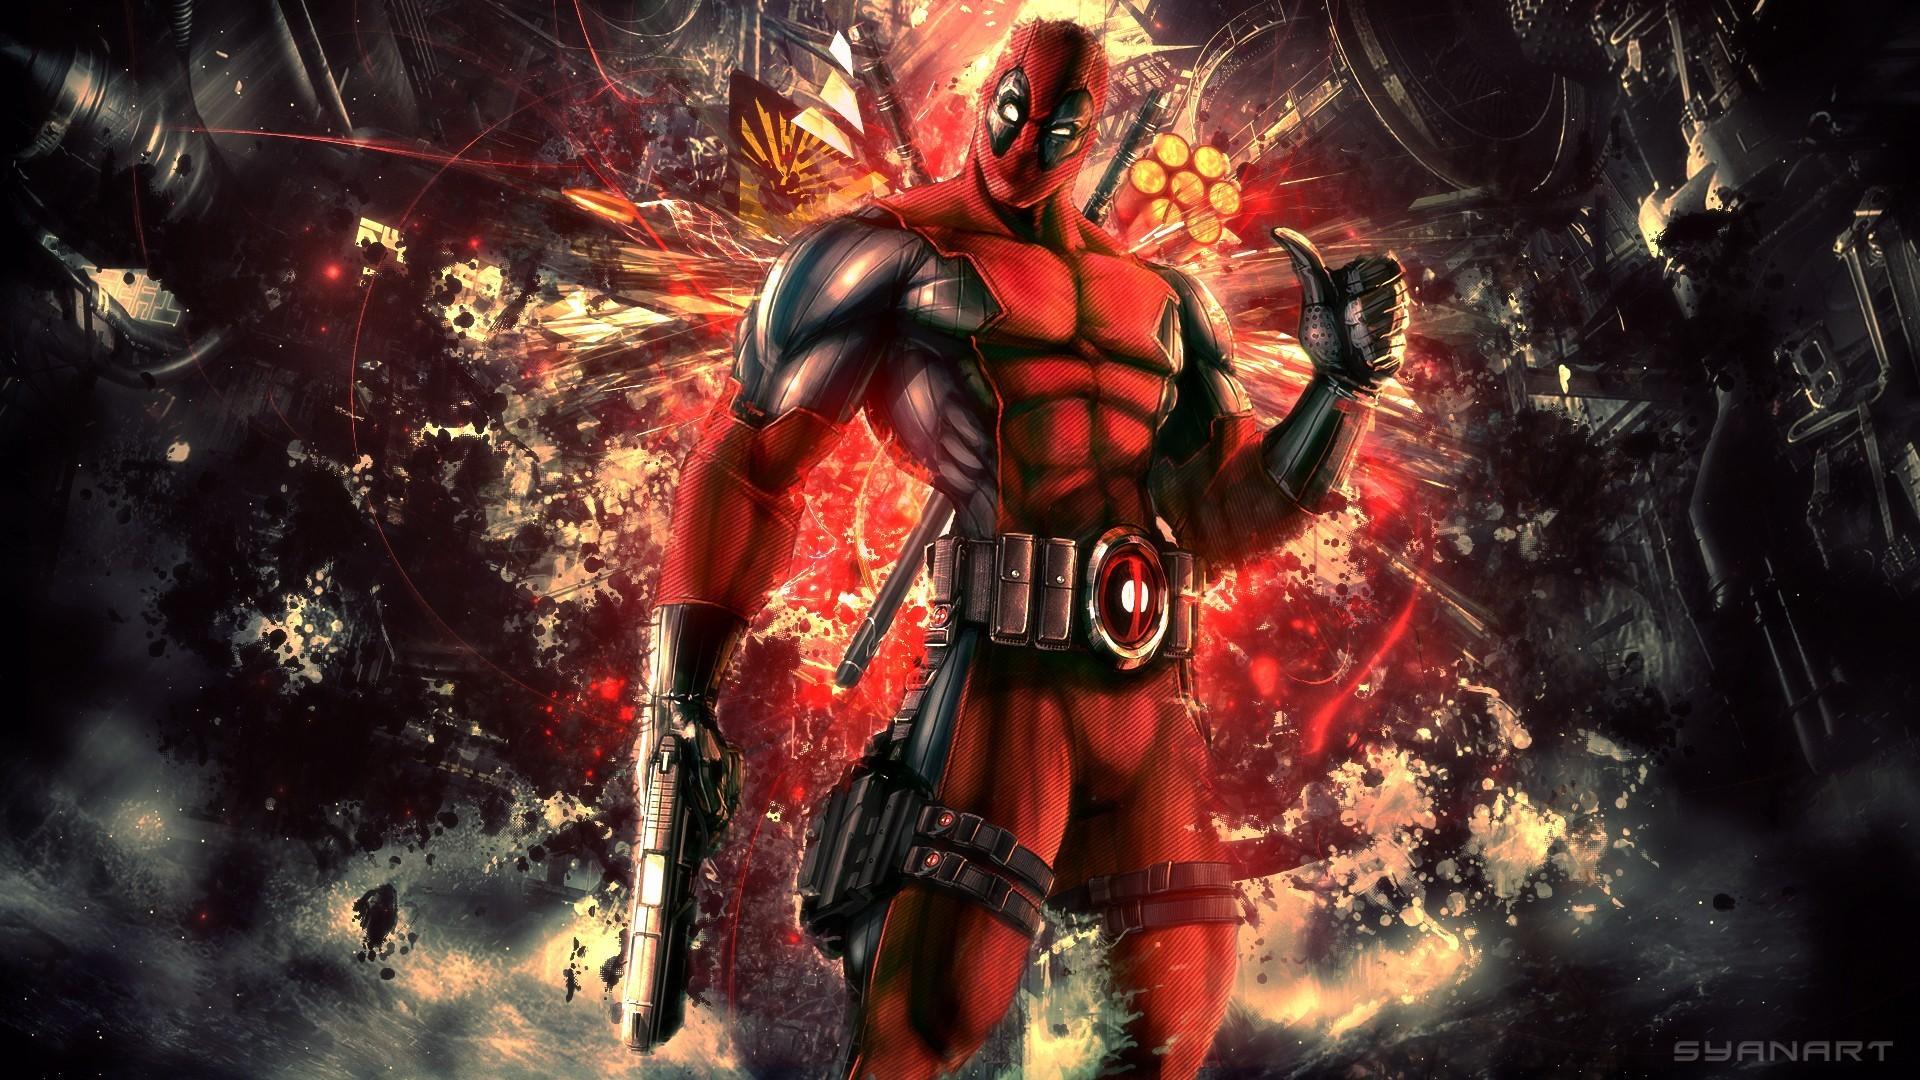 Wallpaper Comics Deadpool Mythology Games Screenshot